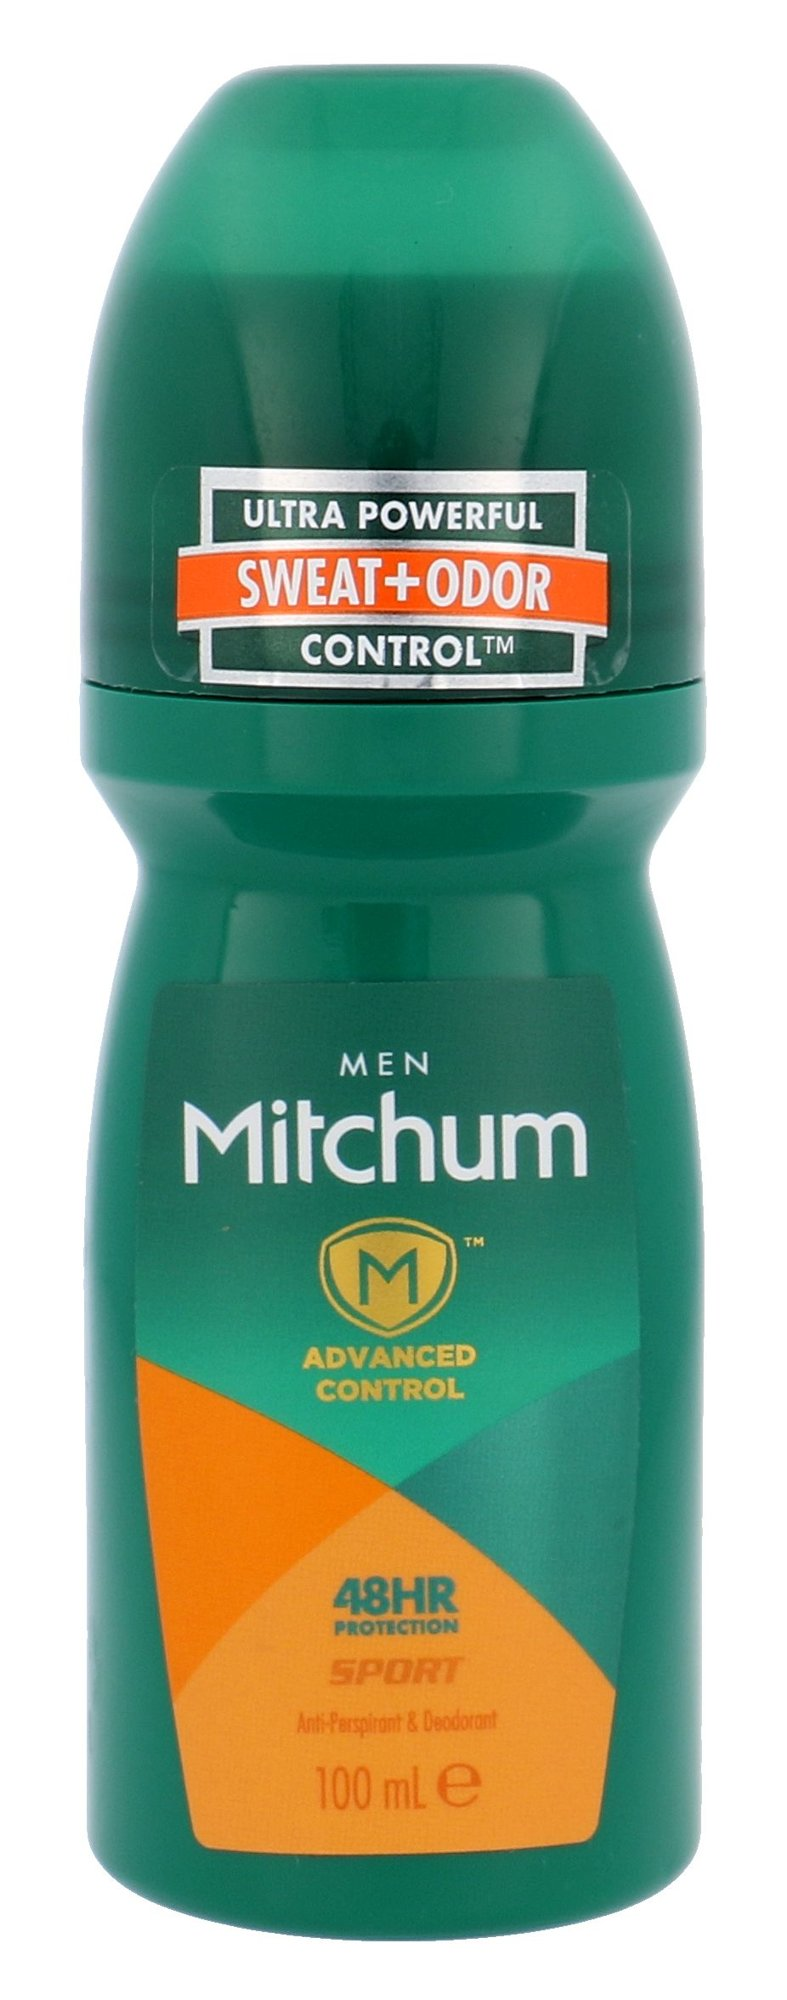 Mitchum Advanced Control Cosmetic 100ml  Sport